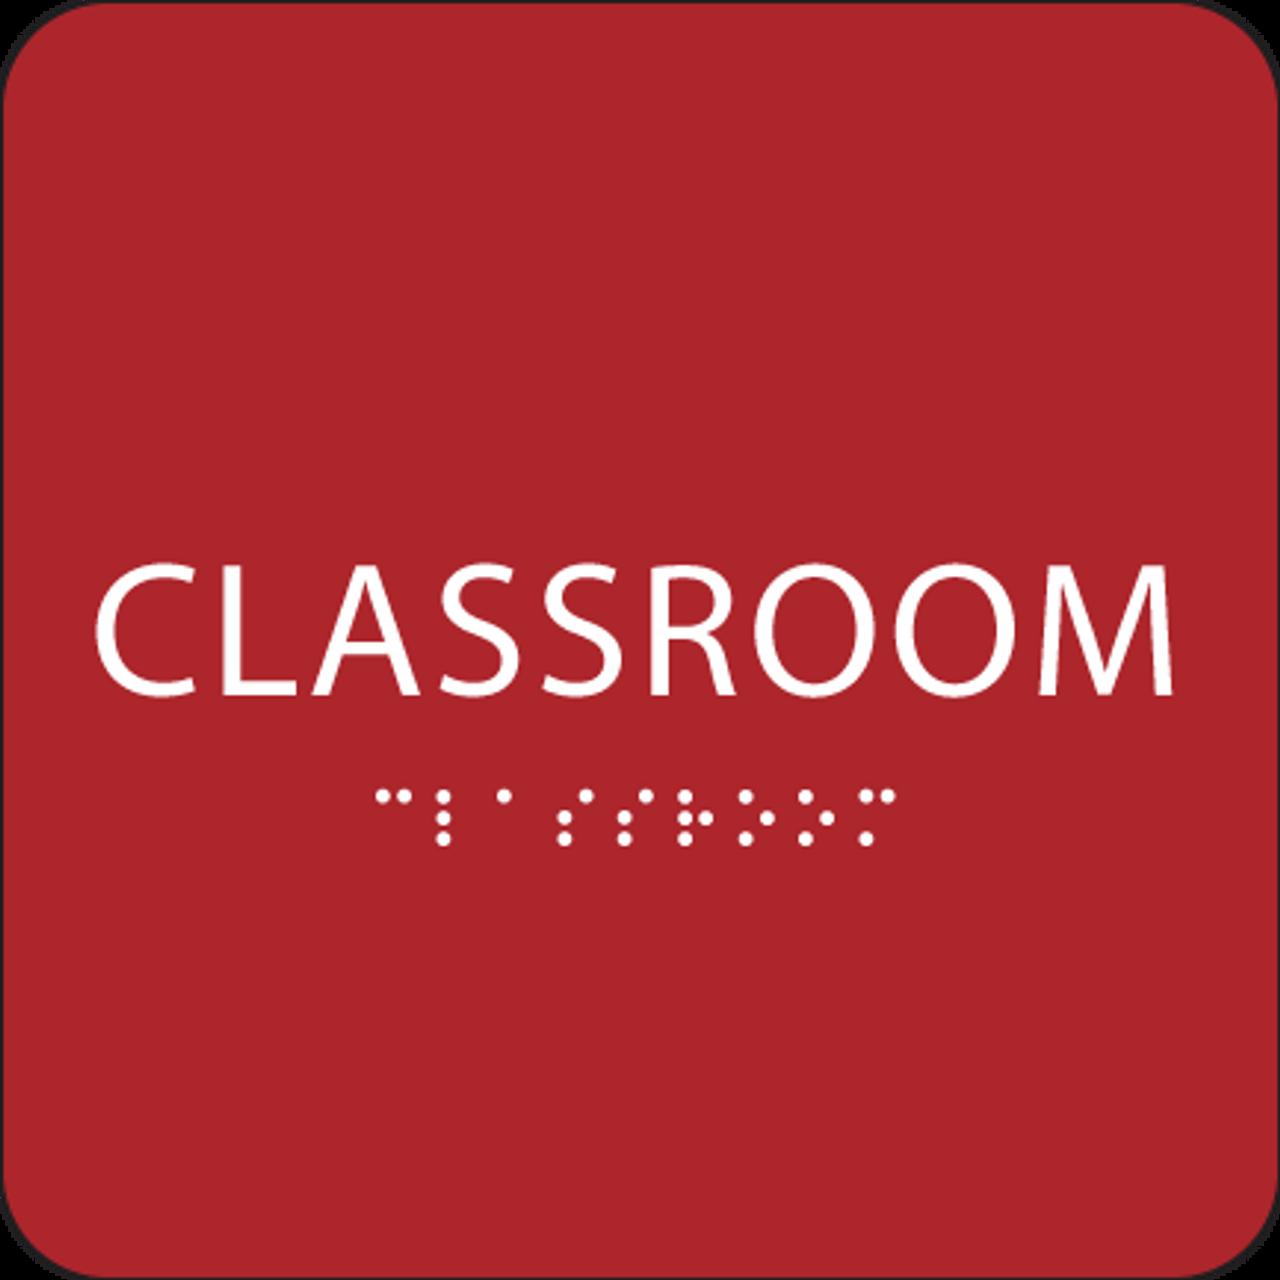 Red Classroom ADA Sign